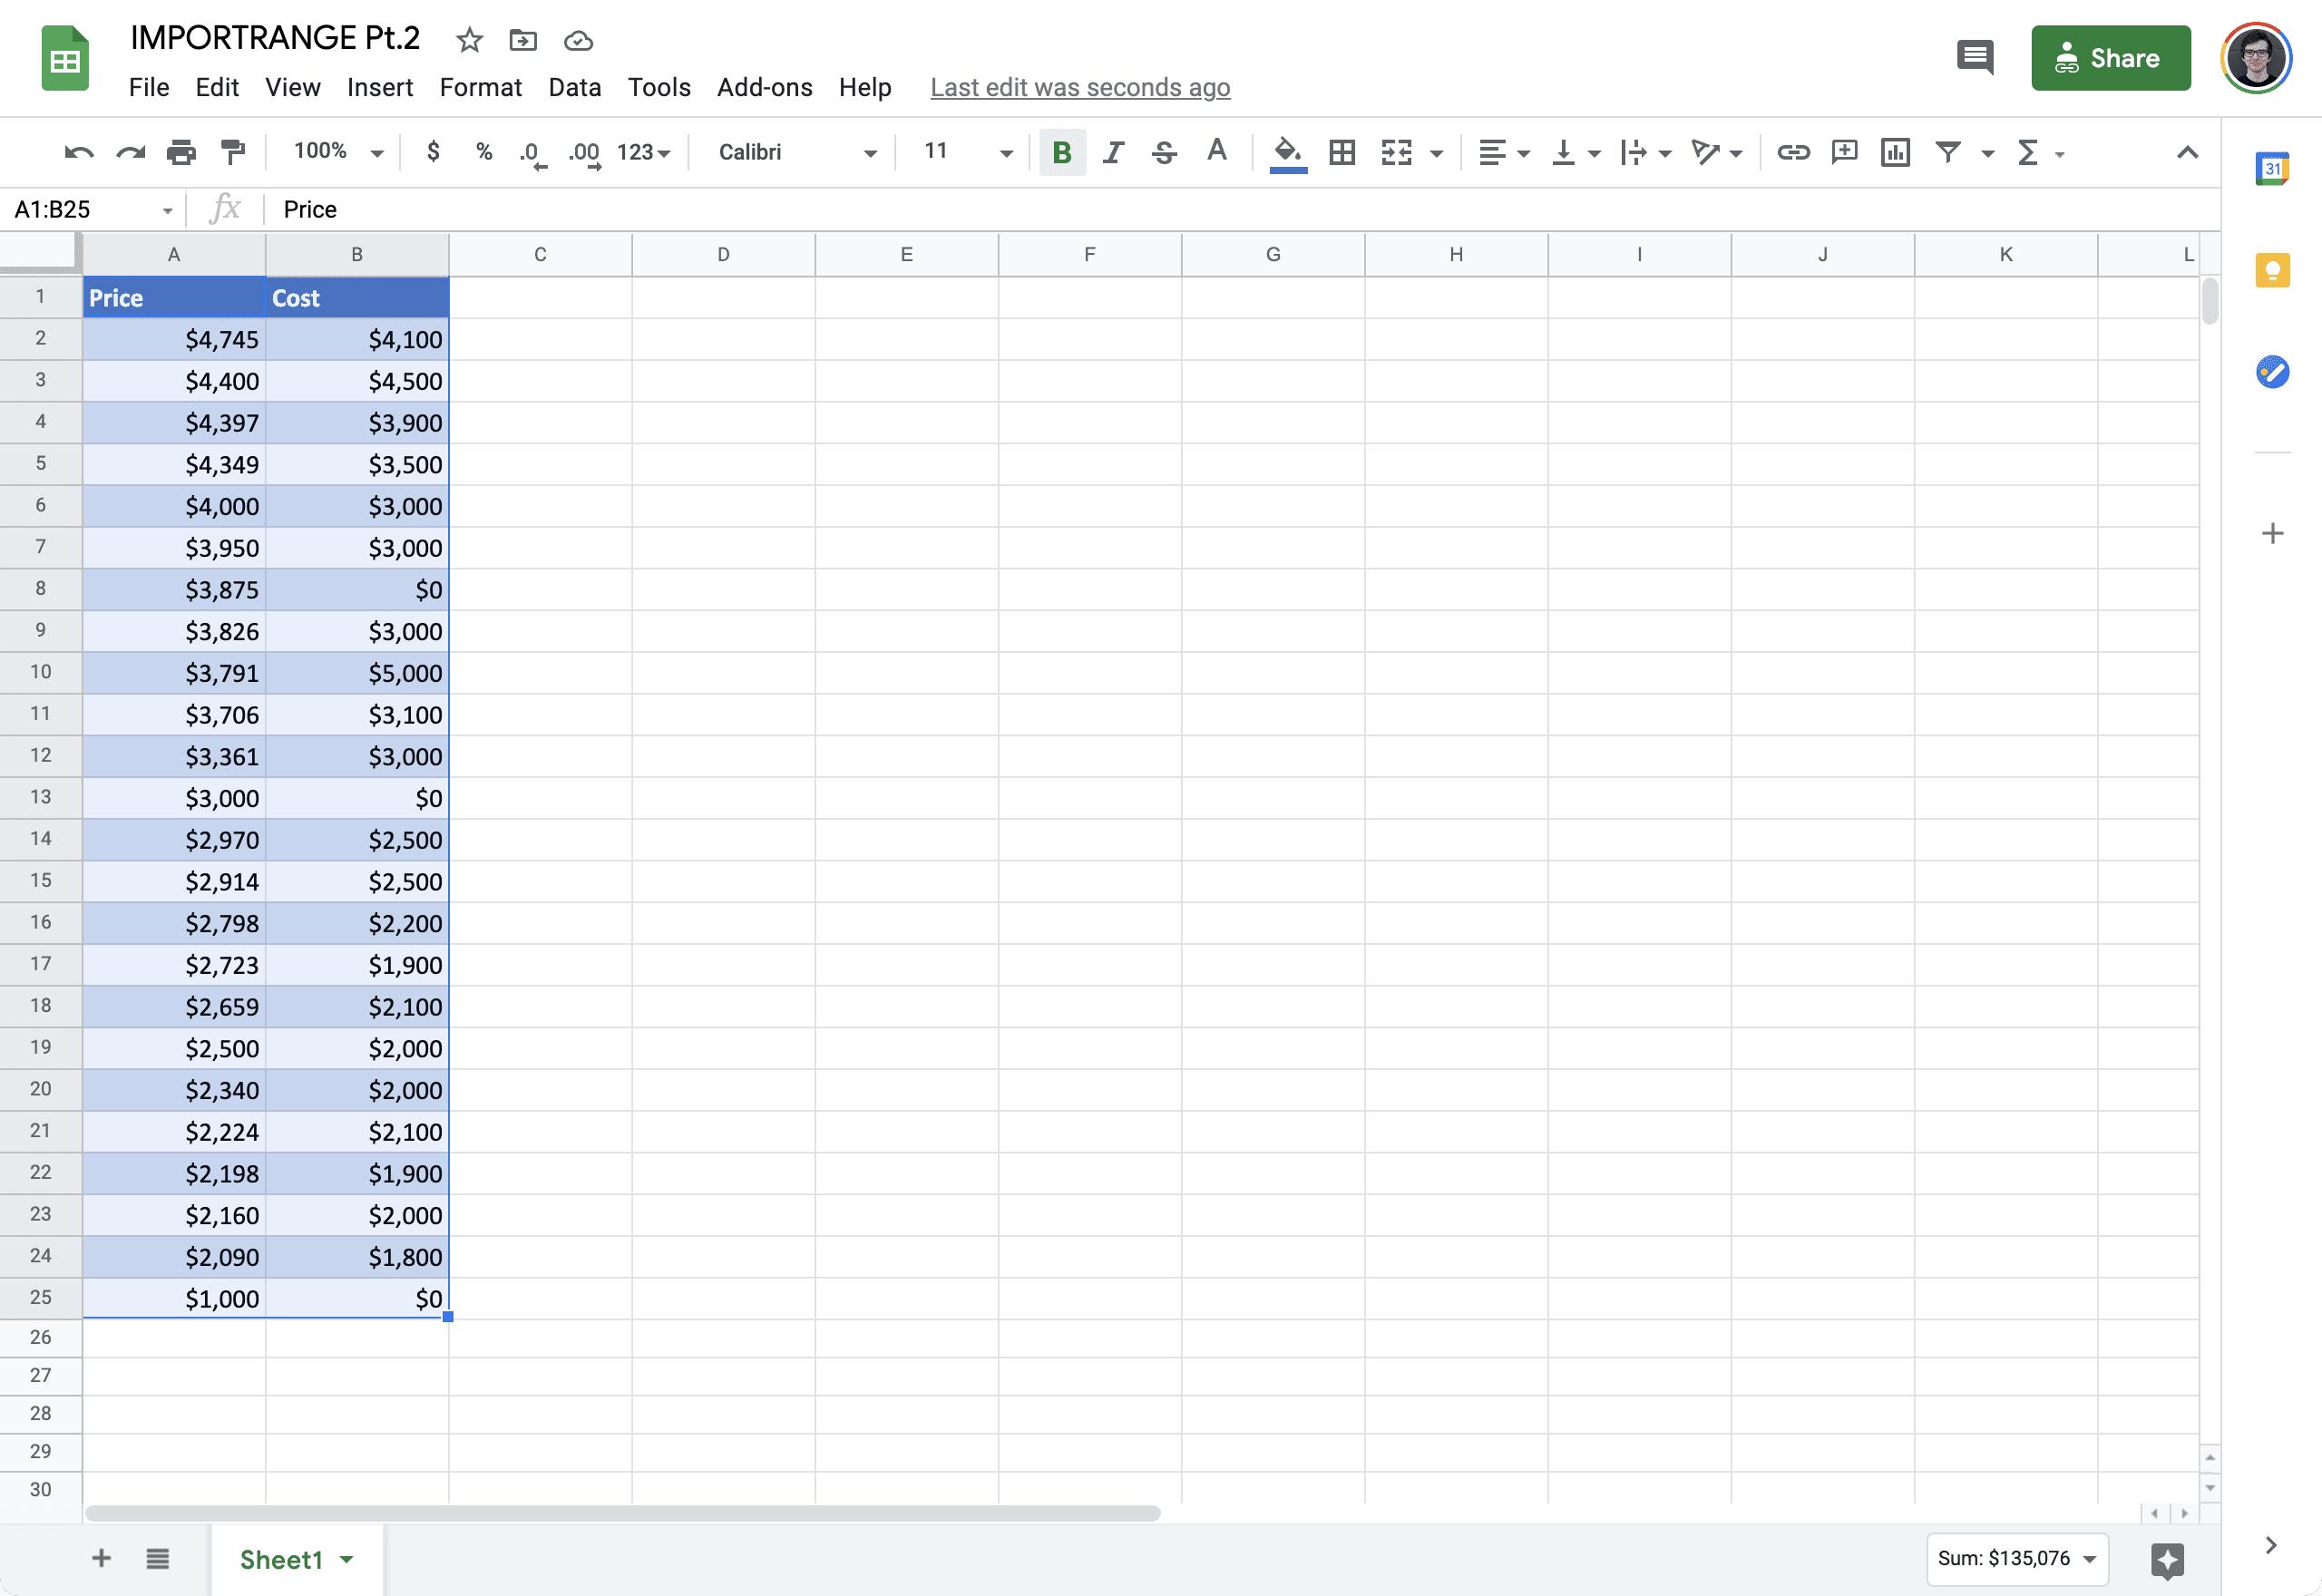 IMPORTRANGE google sheets 1